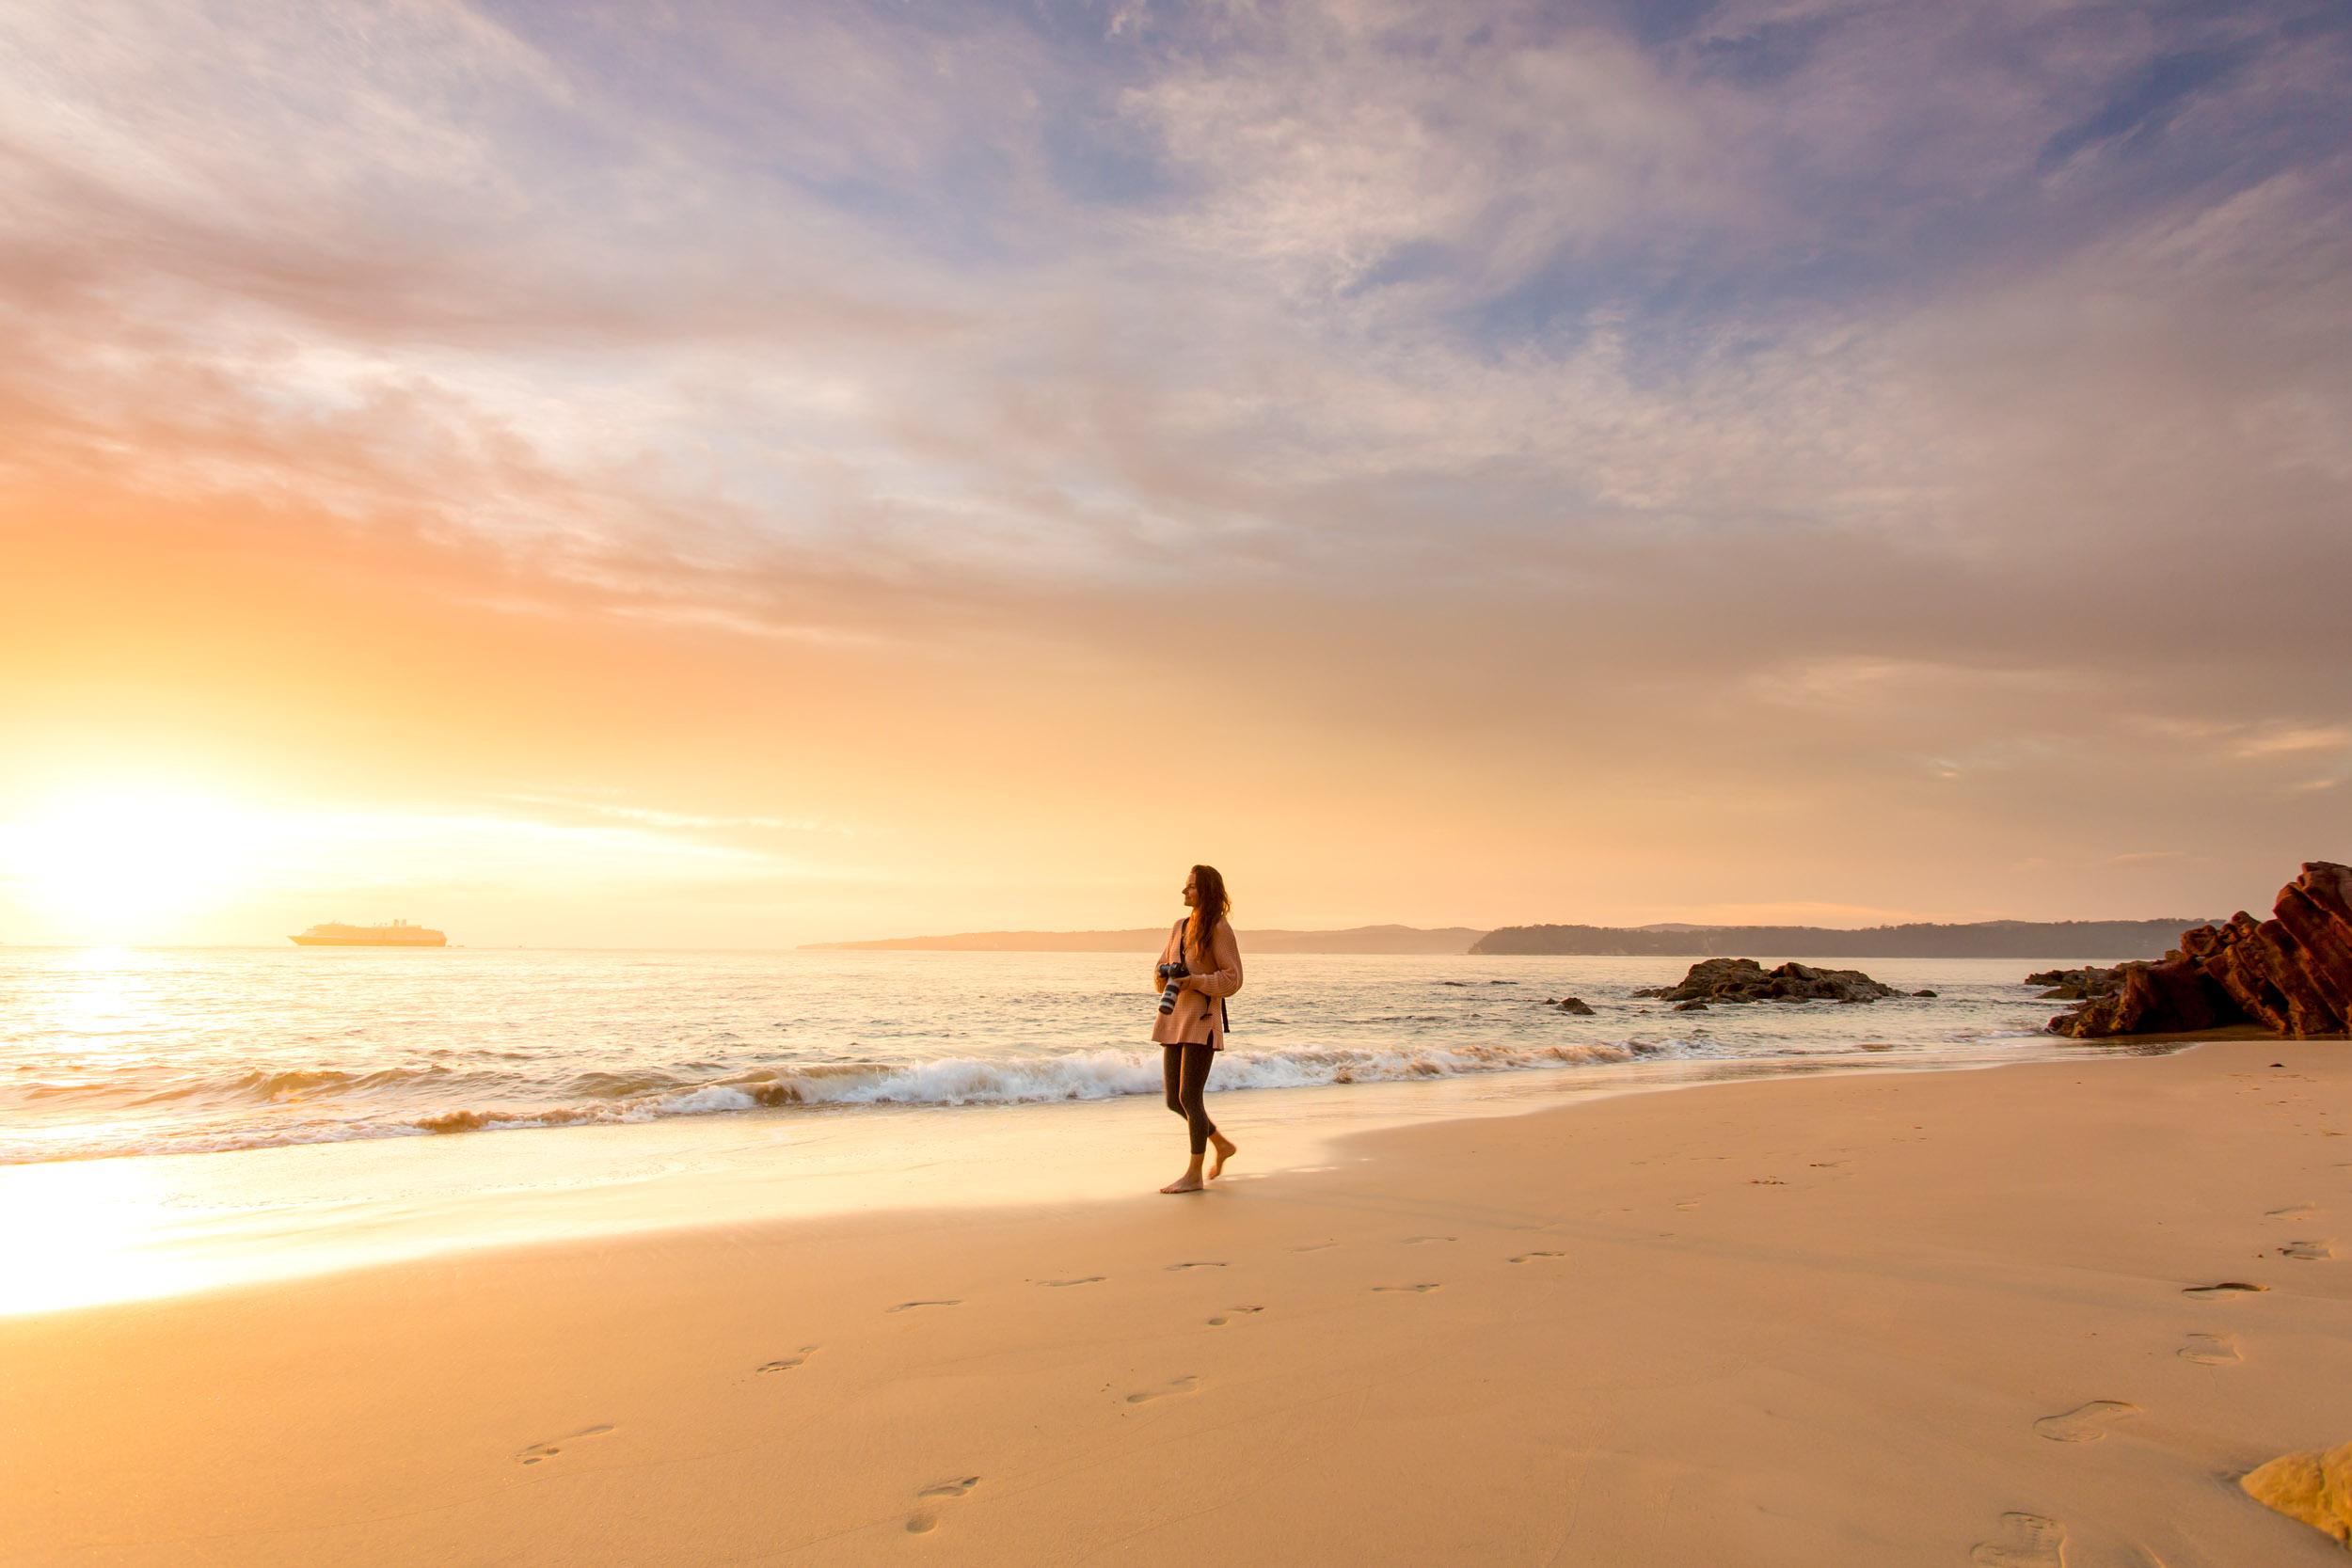 sunrise-photography-south-coast-beaches-nsw.jpg